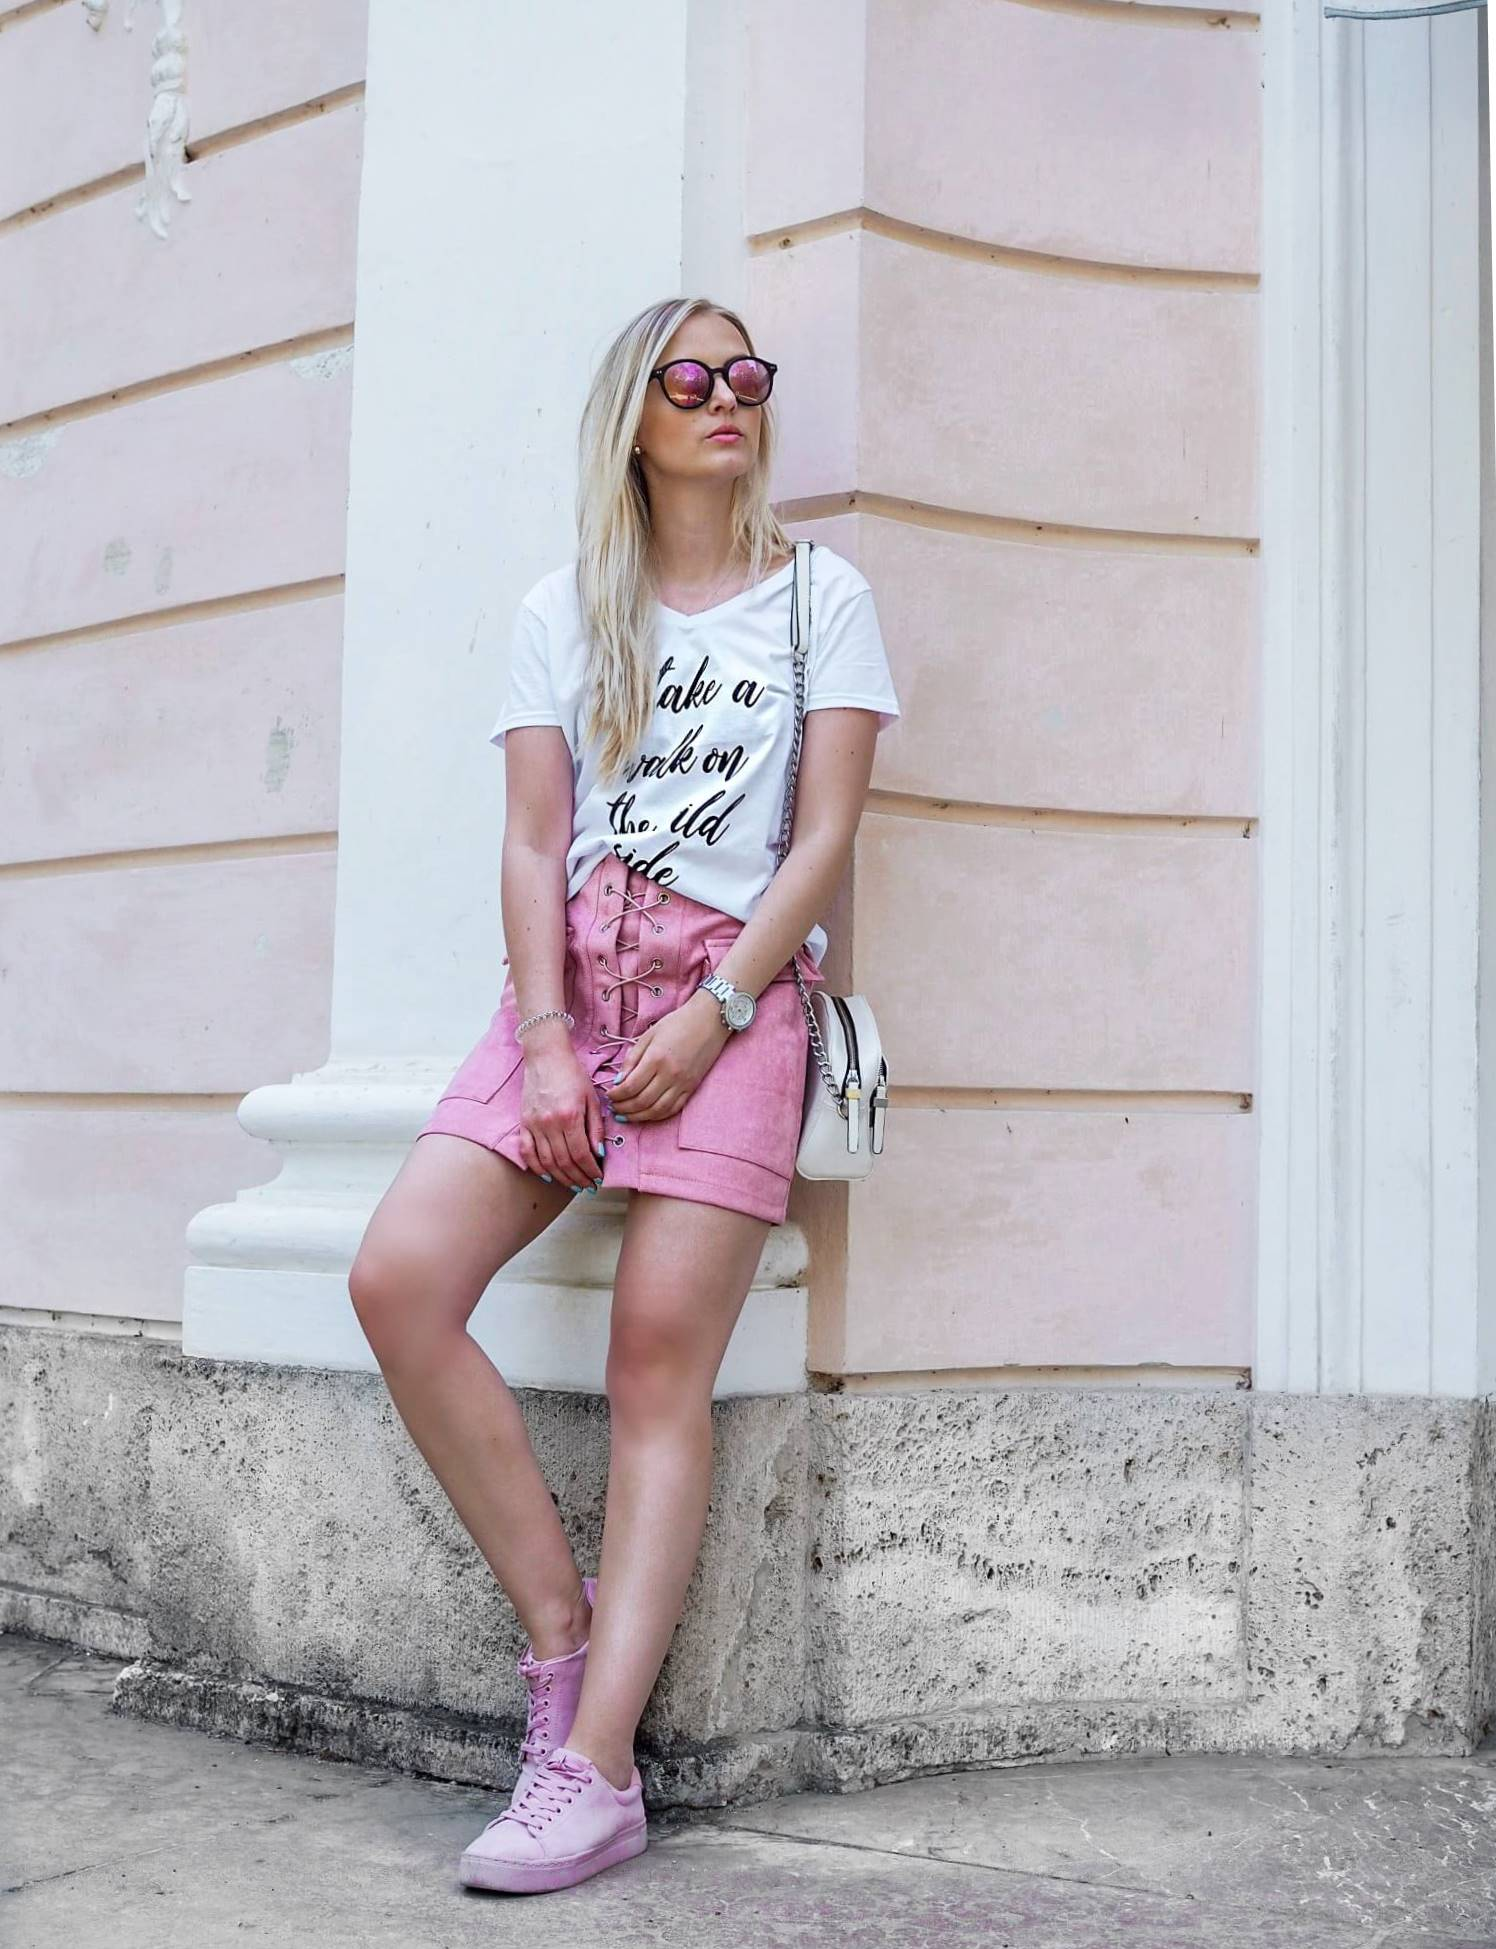 Modeblog Fashionblog Shirt bedrucken Katefully München Shirt selber bedrucken gestalten DIY ootd Modeoutfit Rock Top rosa Streetstyle Fashiontipps Designerin